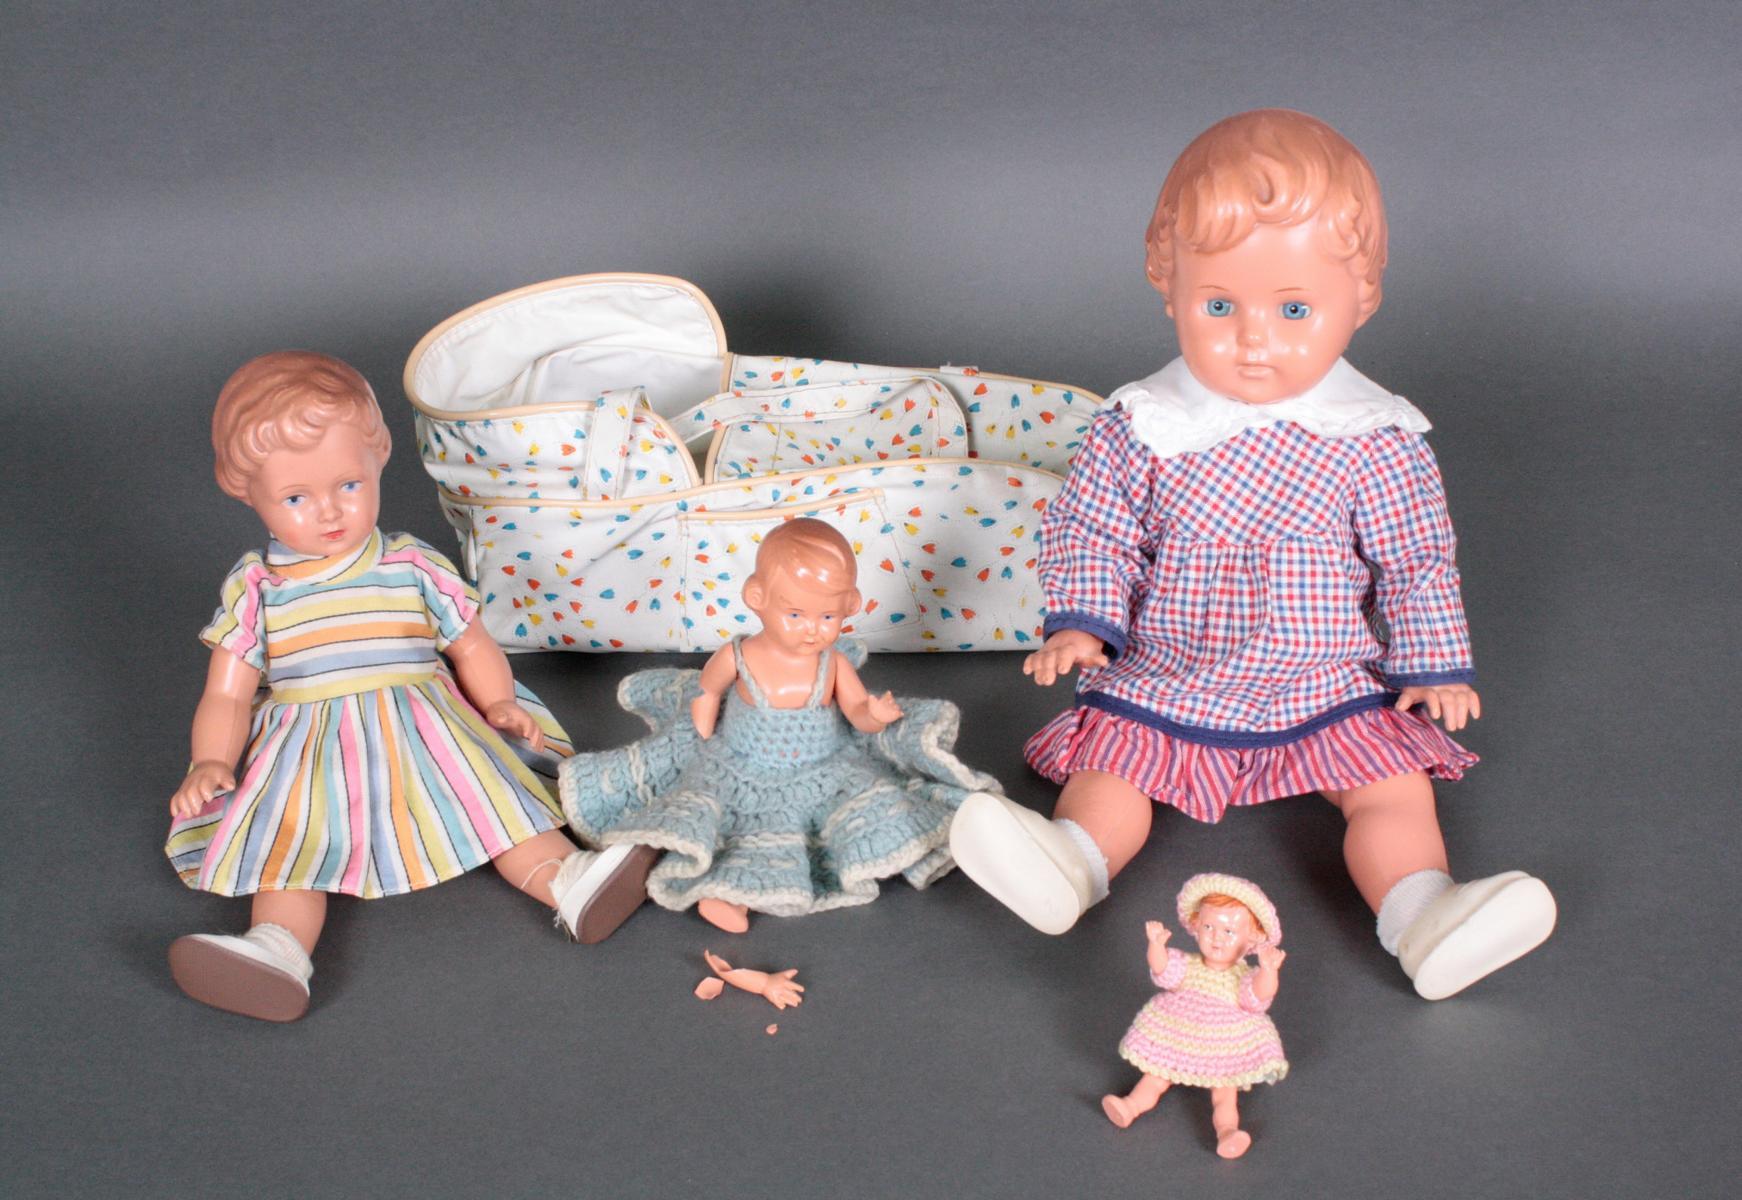 Vier Celluloid Puppen-Mädchen